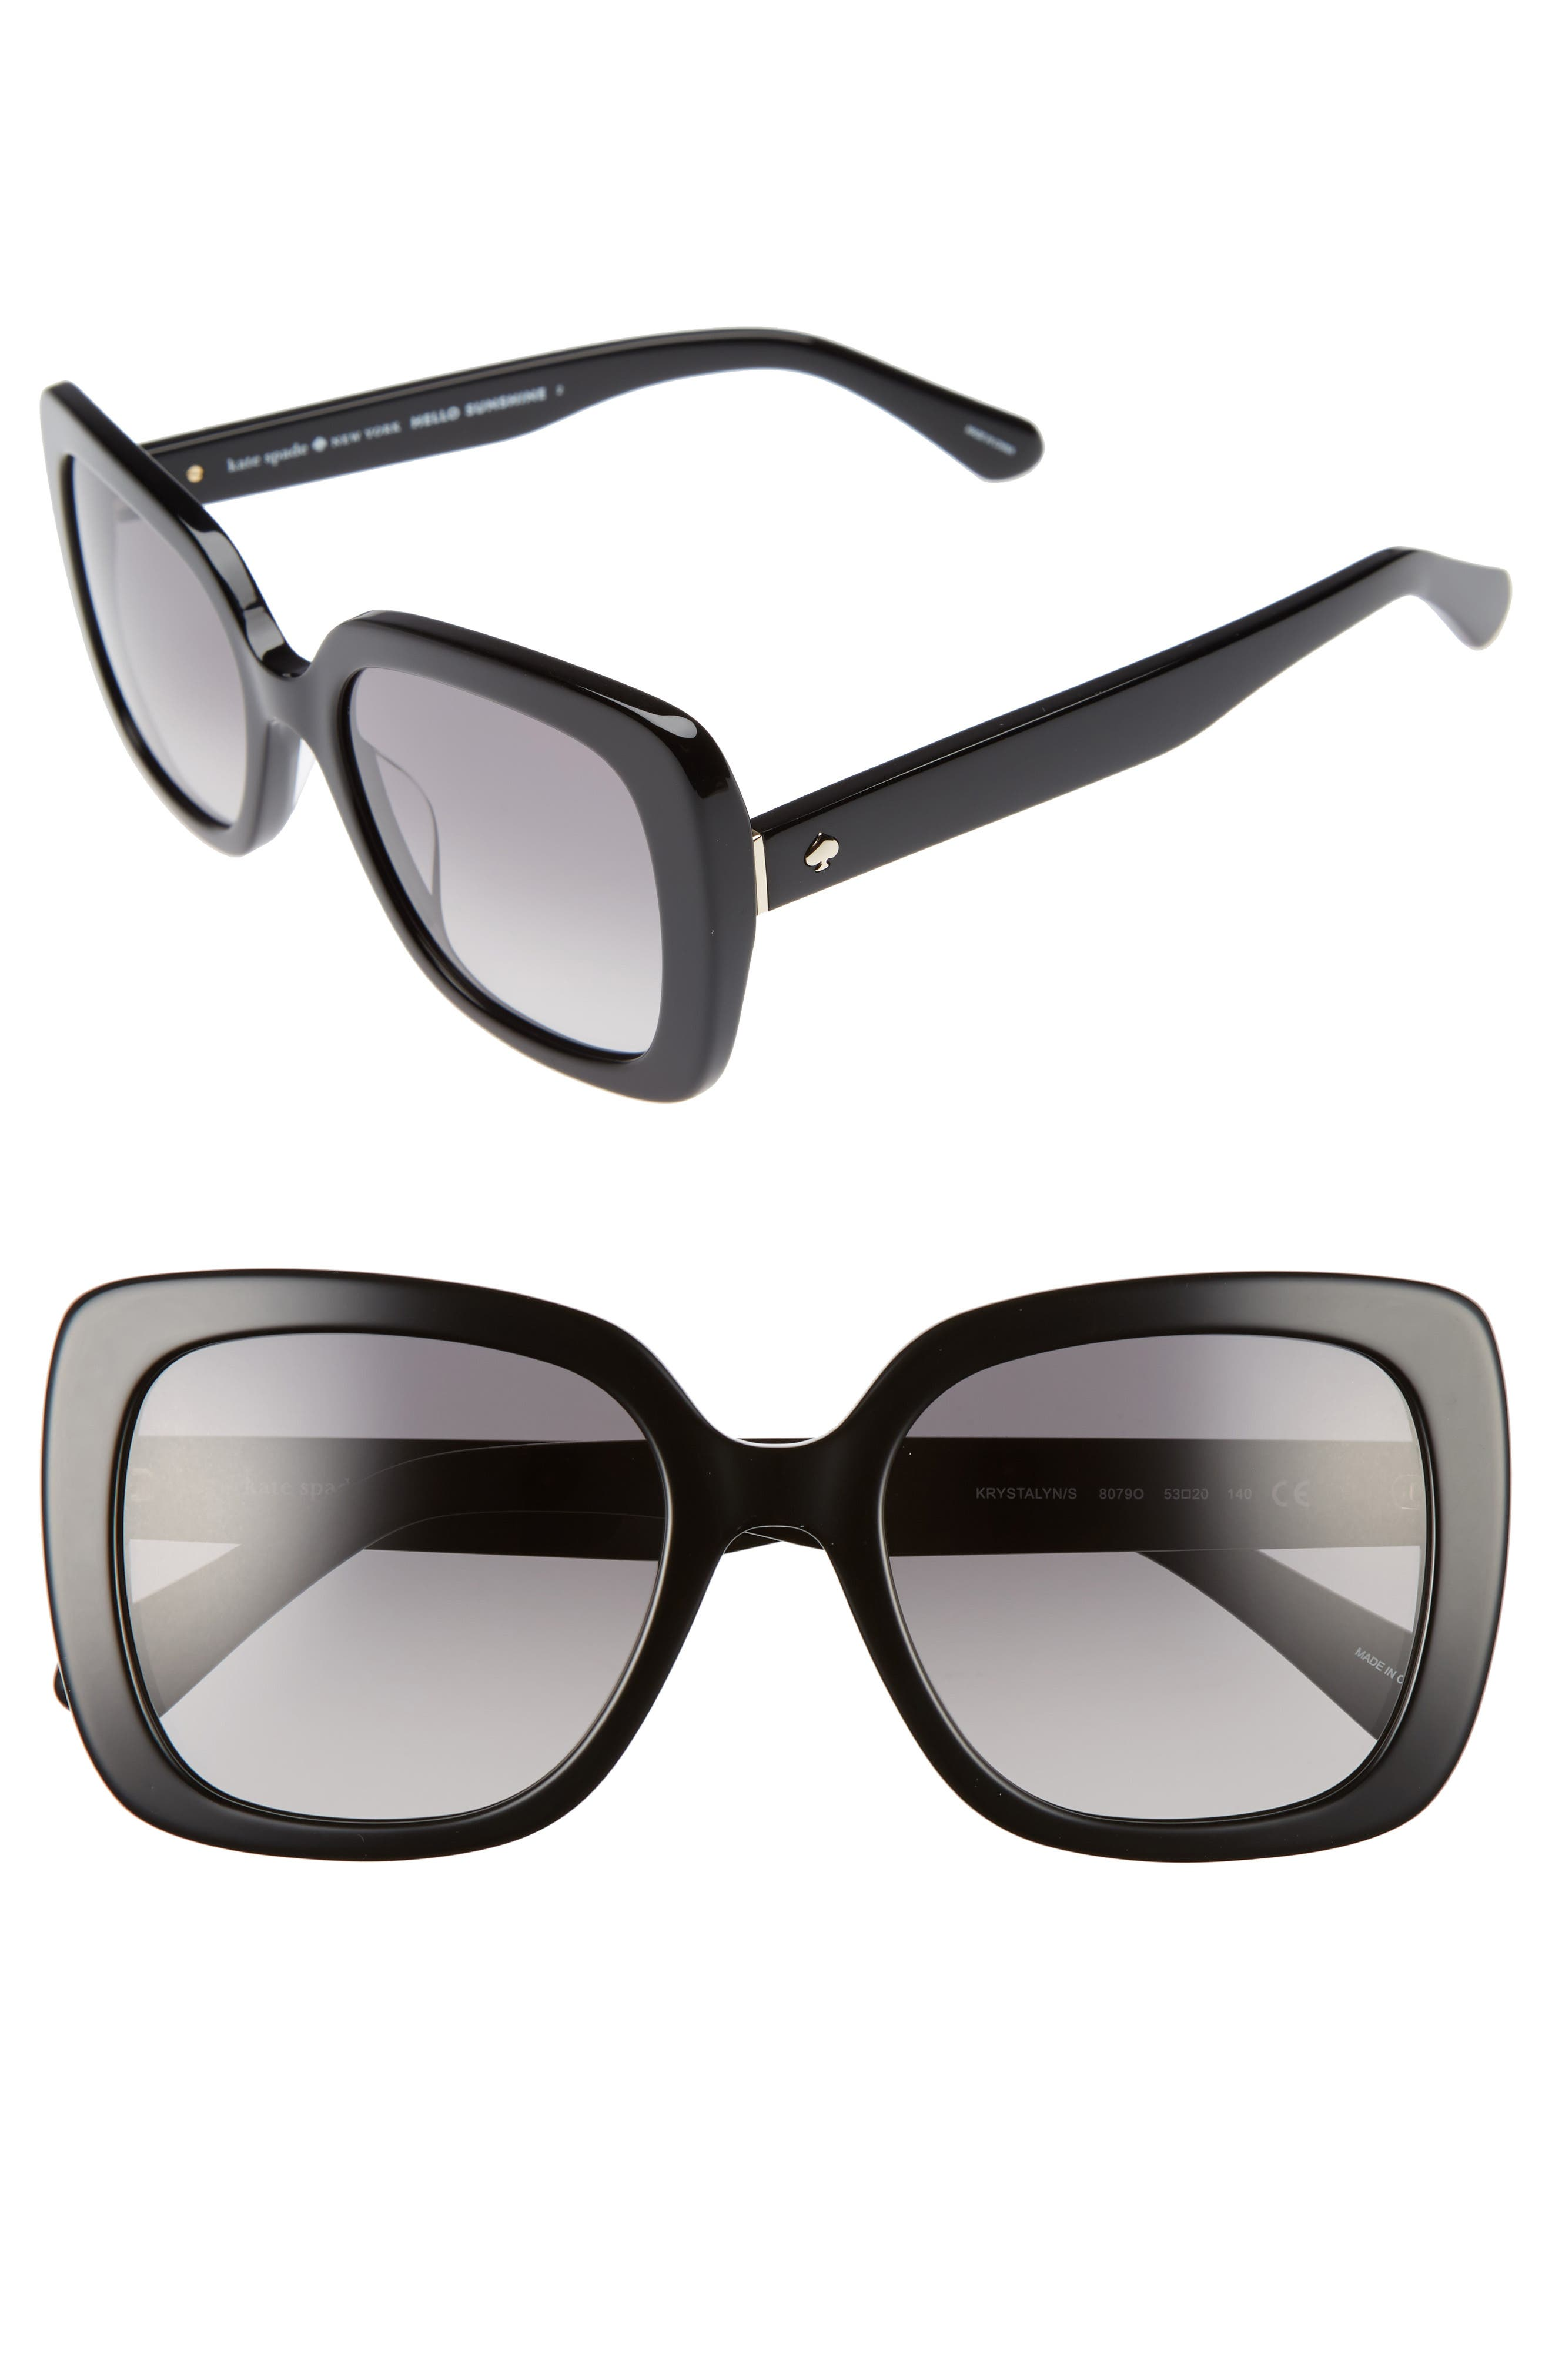 KATE SPADE NEW YORK krystalyn 53mm Sunglasses